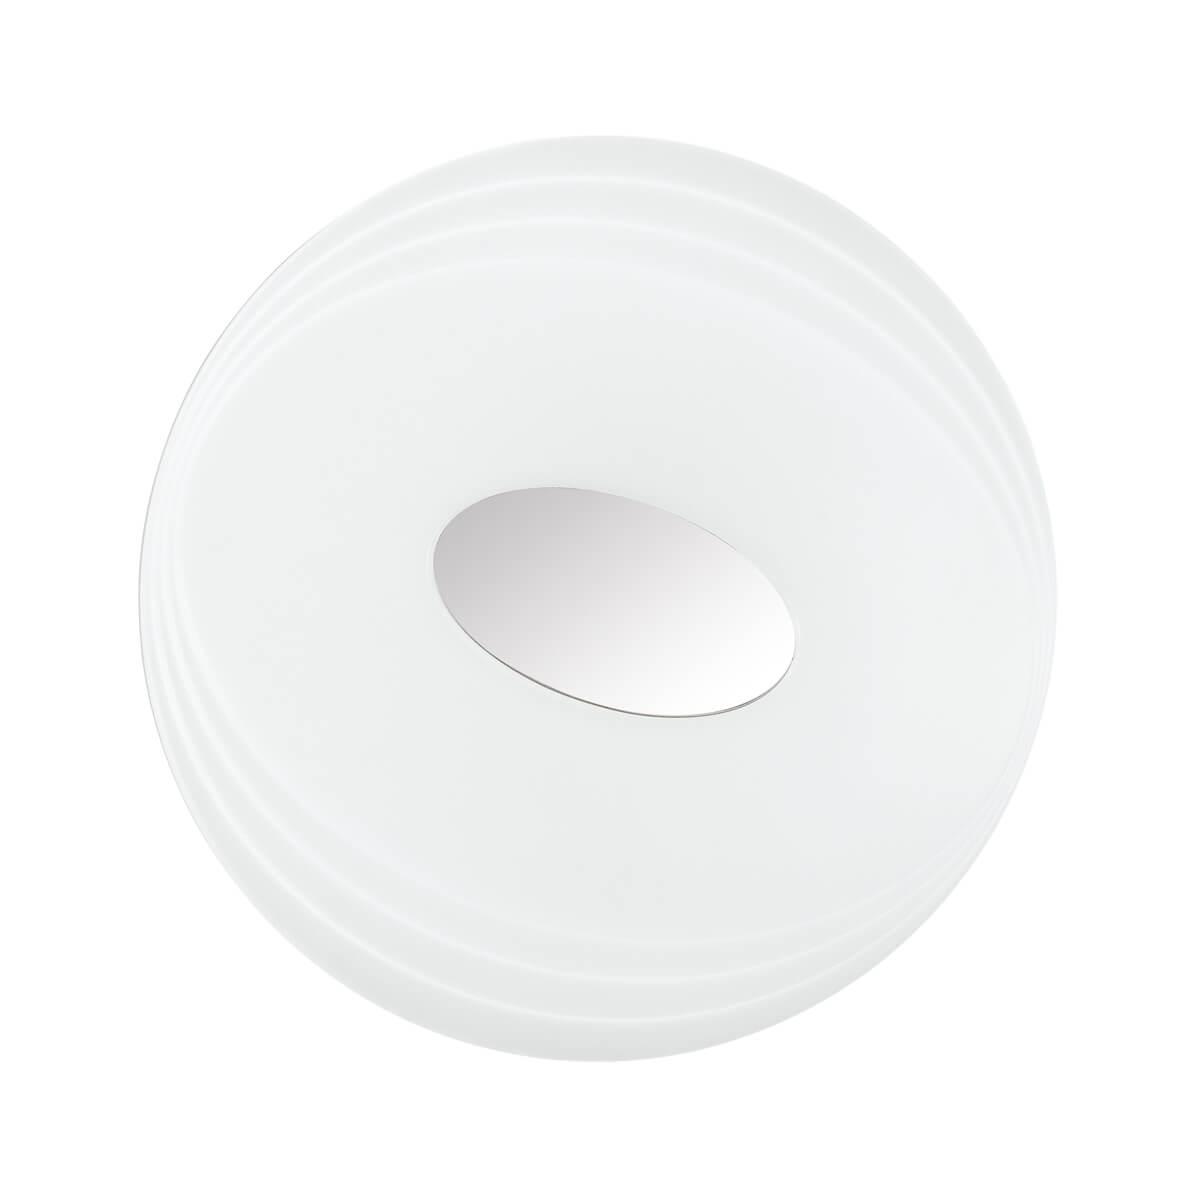 Светильник Sonex 3027/EL светильник sonex 2049 el